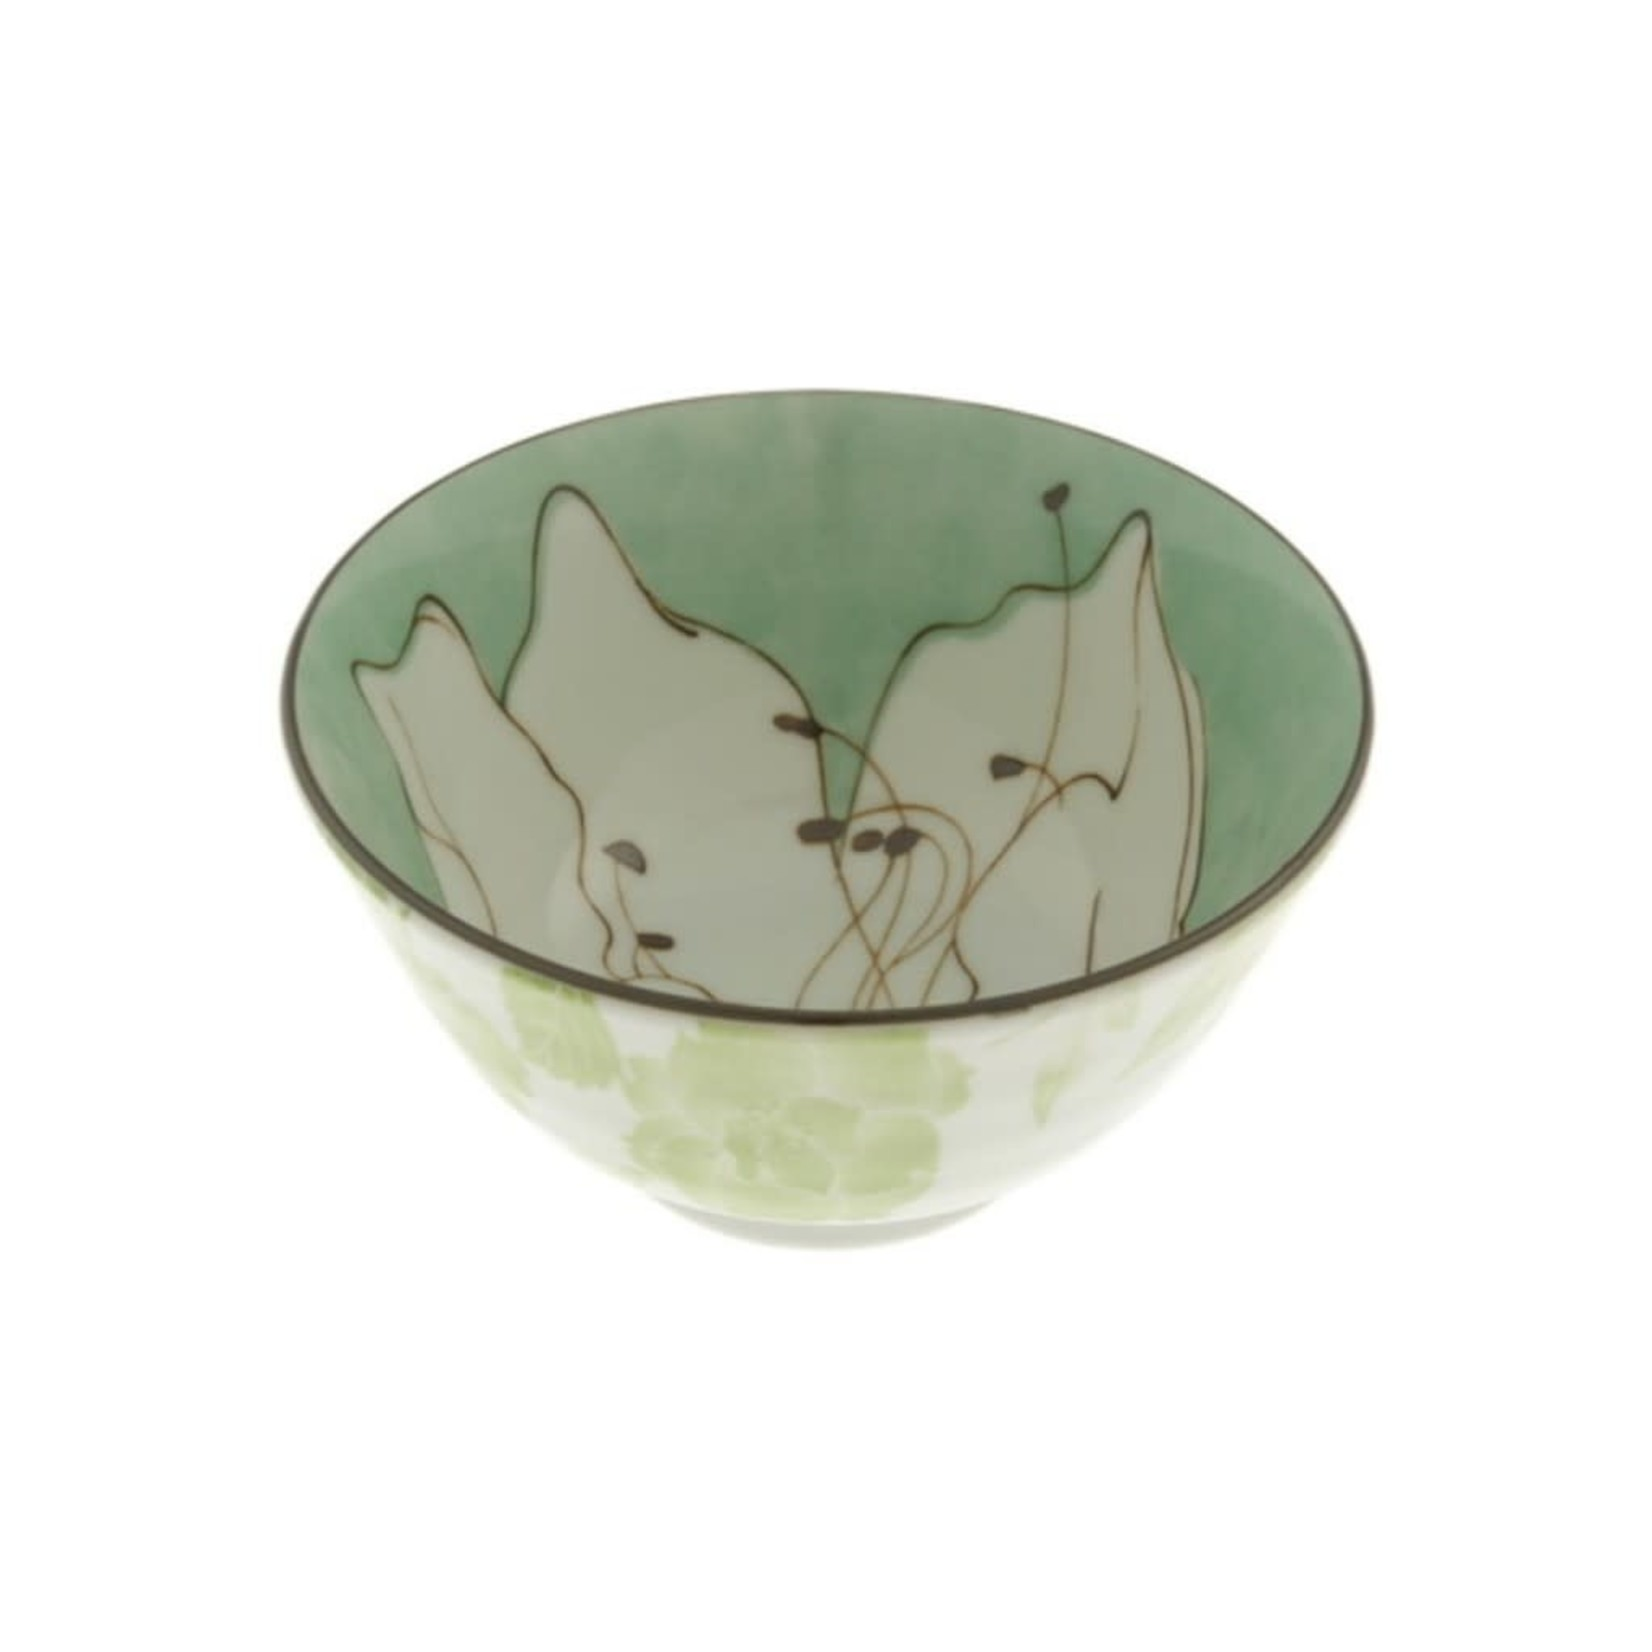 "Kotobuki Trading Co. Inc Bowl Green Azalea Sketch 5-1/4"""